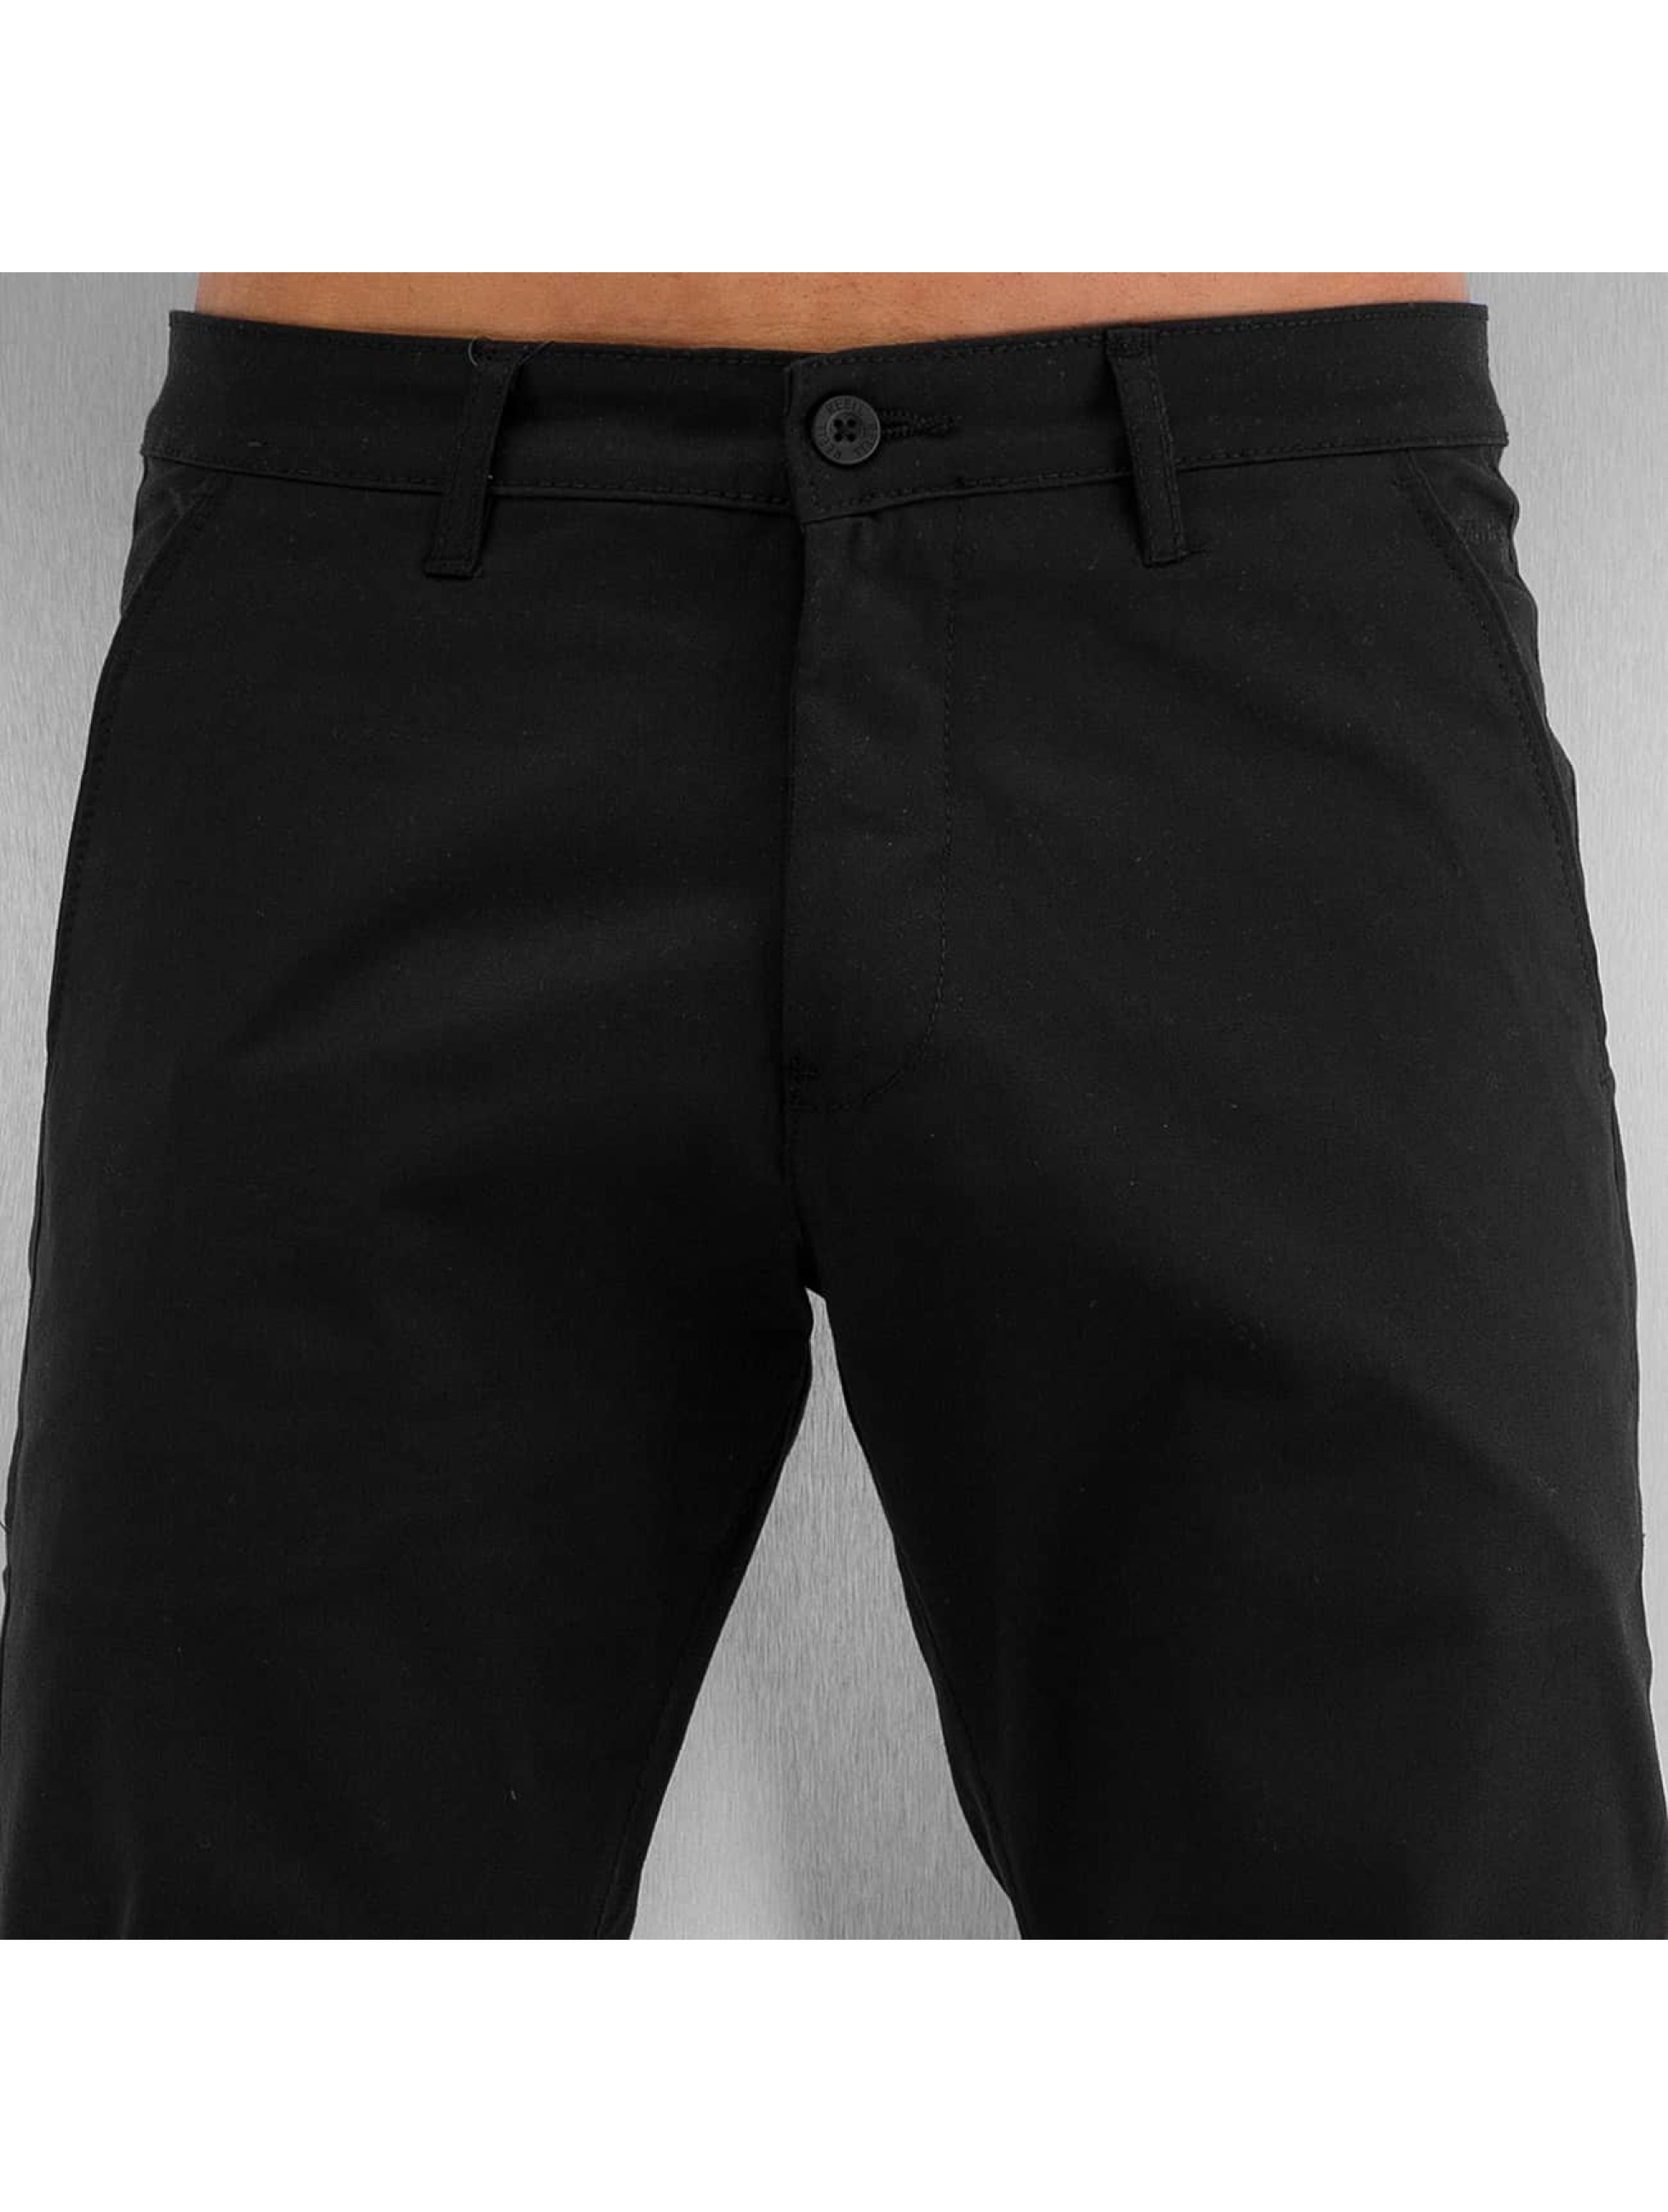 Reell Jeans Pantalon chino Straight Flex noir